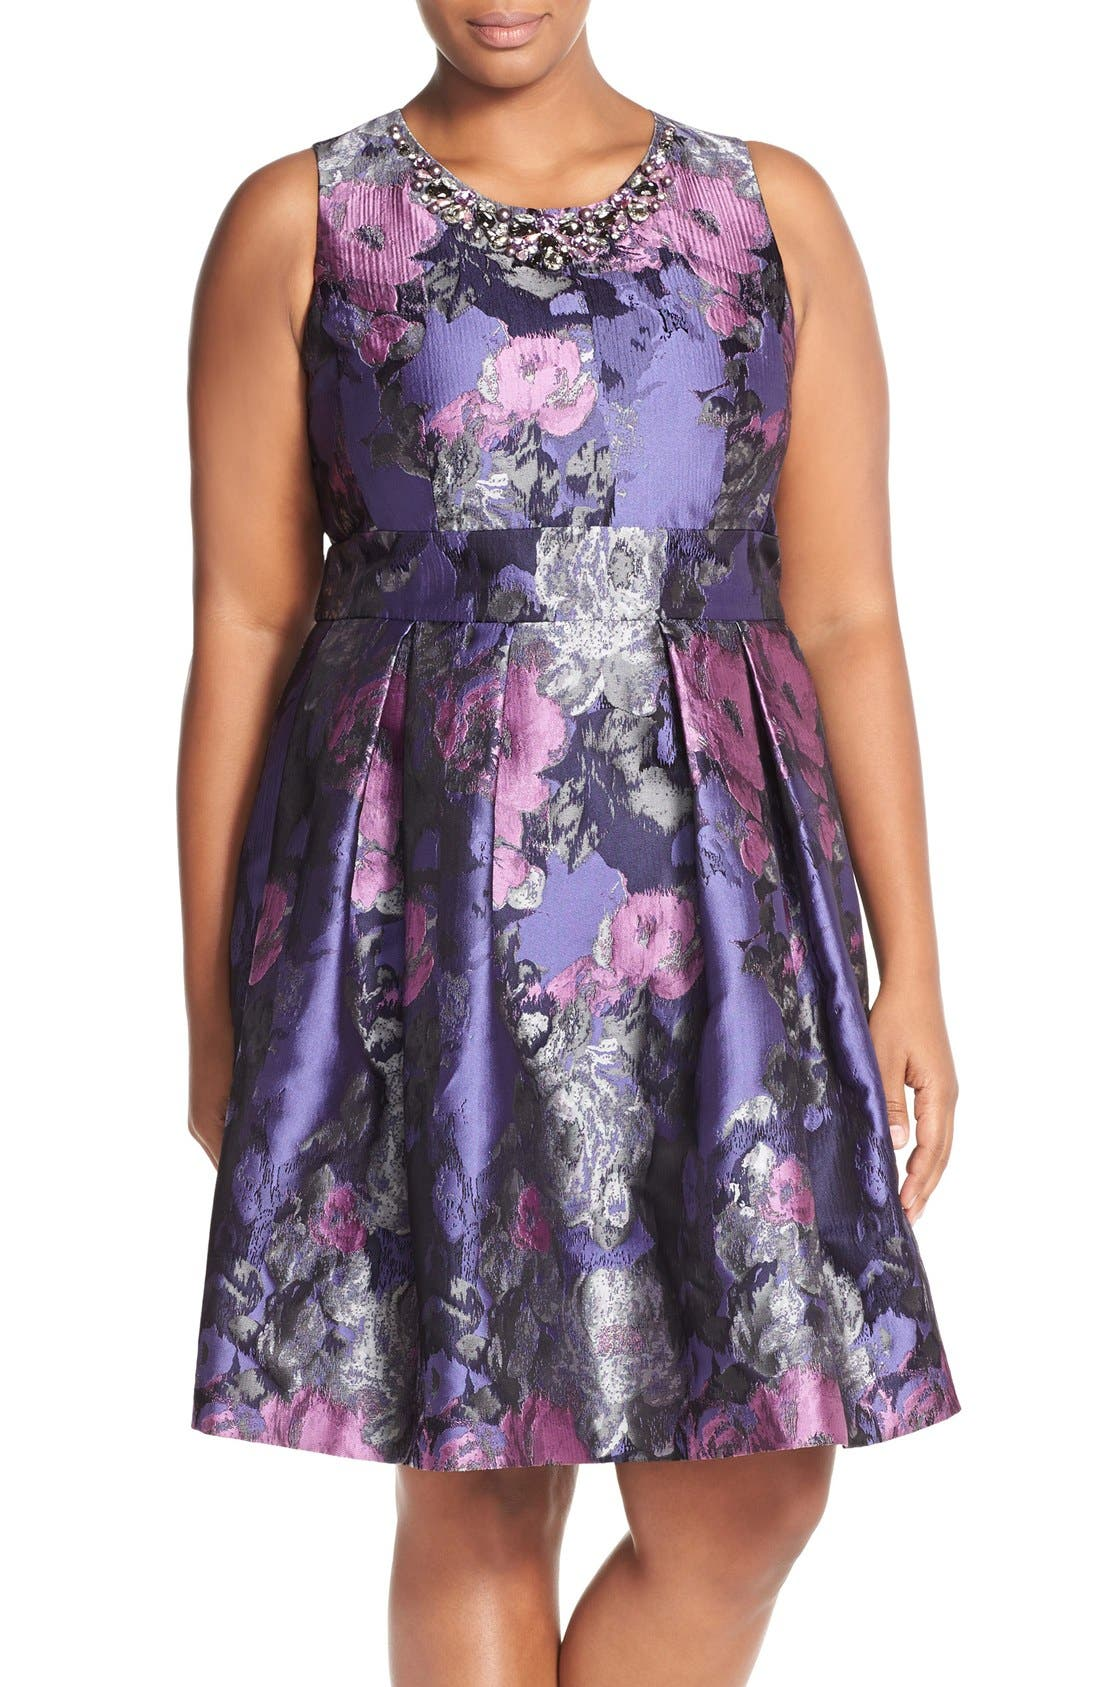 ELIZA J, Embellished Neck Metallic Jacquard Fit & Flare Dress, Main thumbnail 1, color, 523